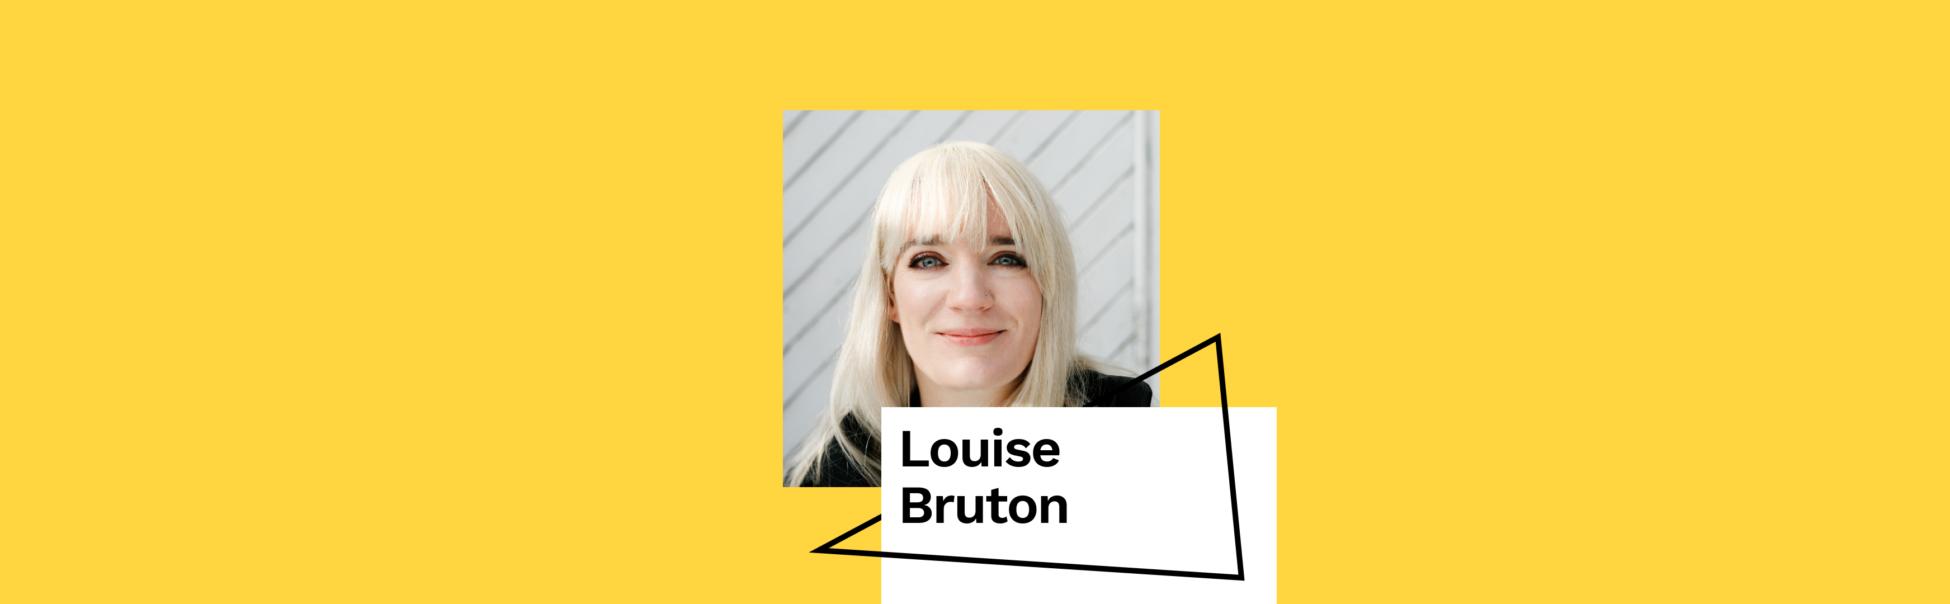 Louise Bruton